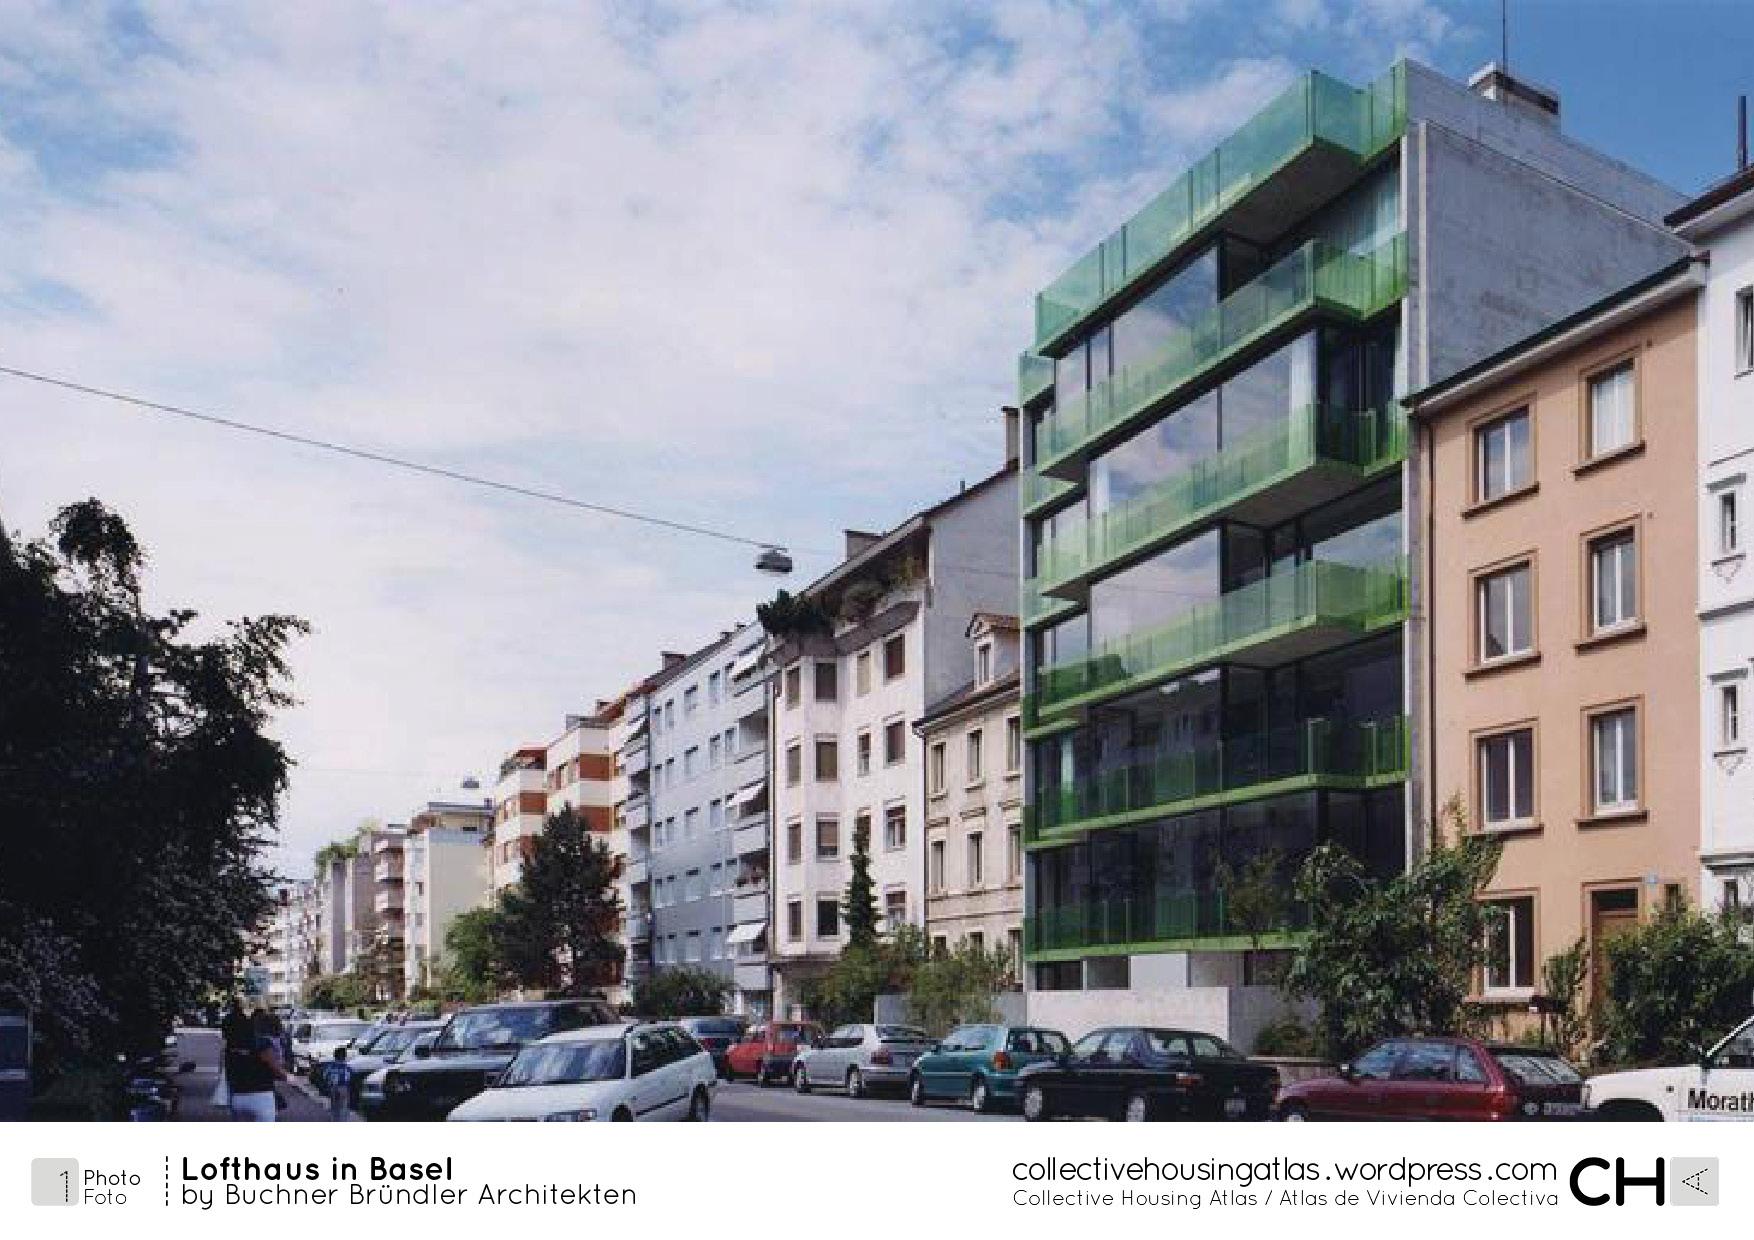 Cha 131108 lofthaus in basel buchner br ndler architekten - Architekten basel ...